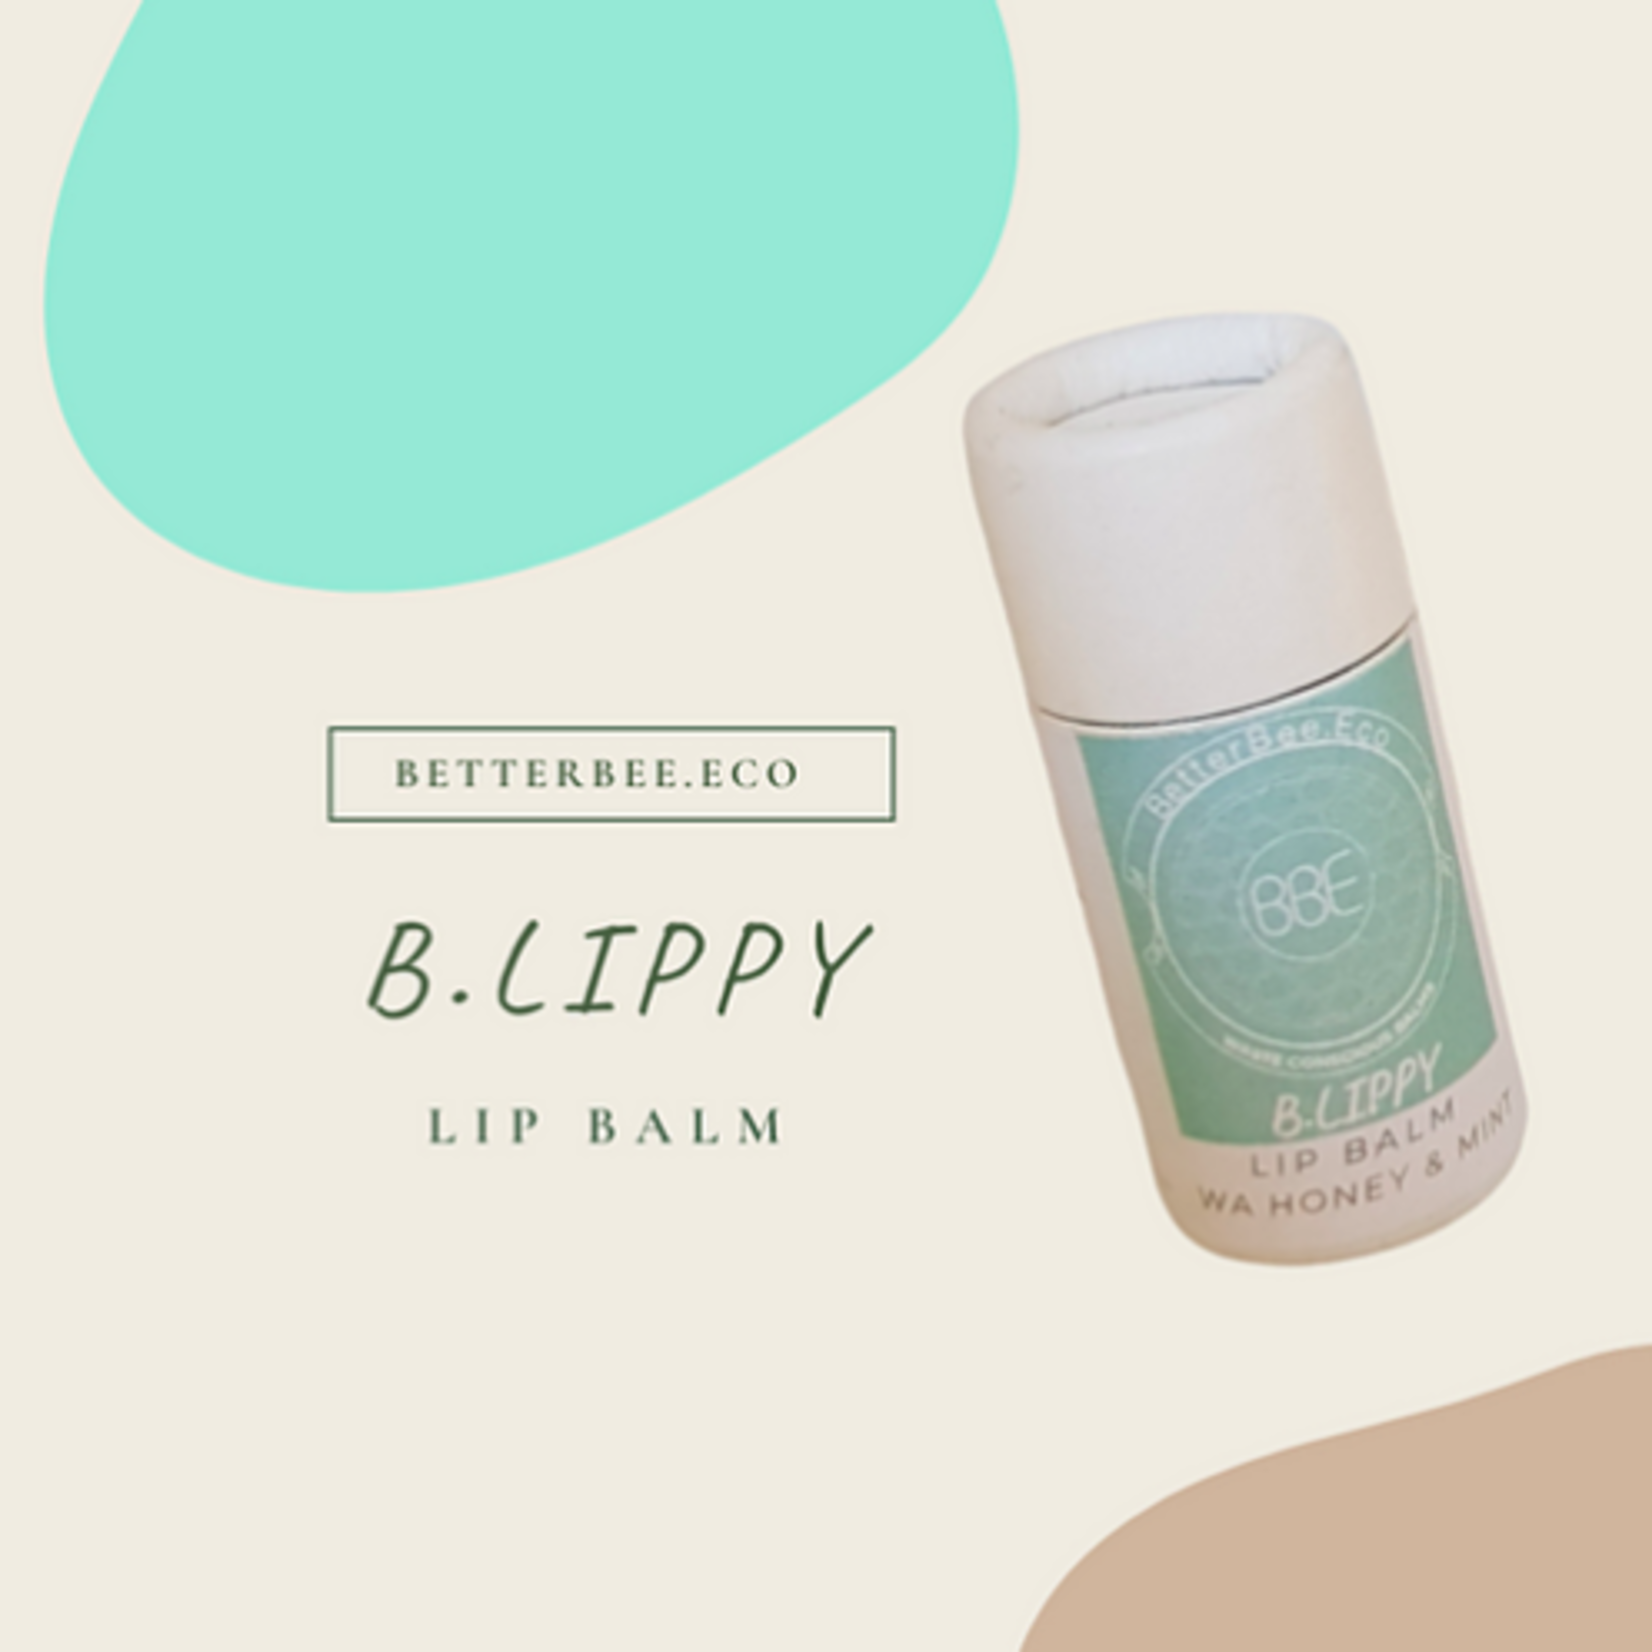 Better Bee Eco Better Bee Eco B.Lippy Lip Balm WA Honey & Mint